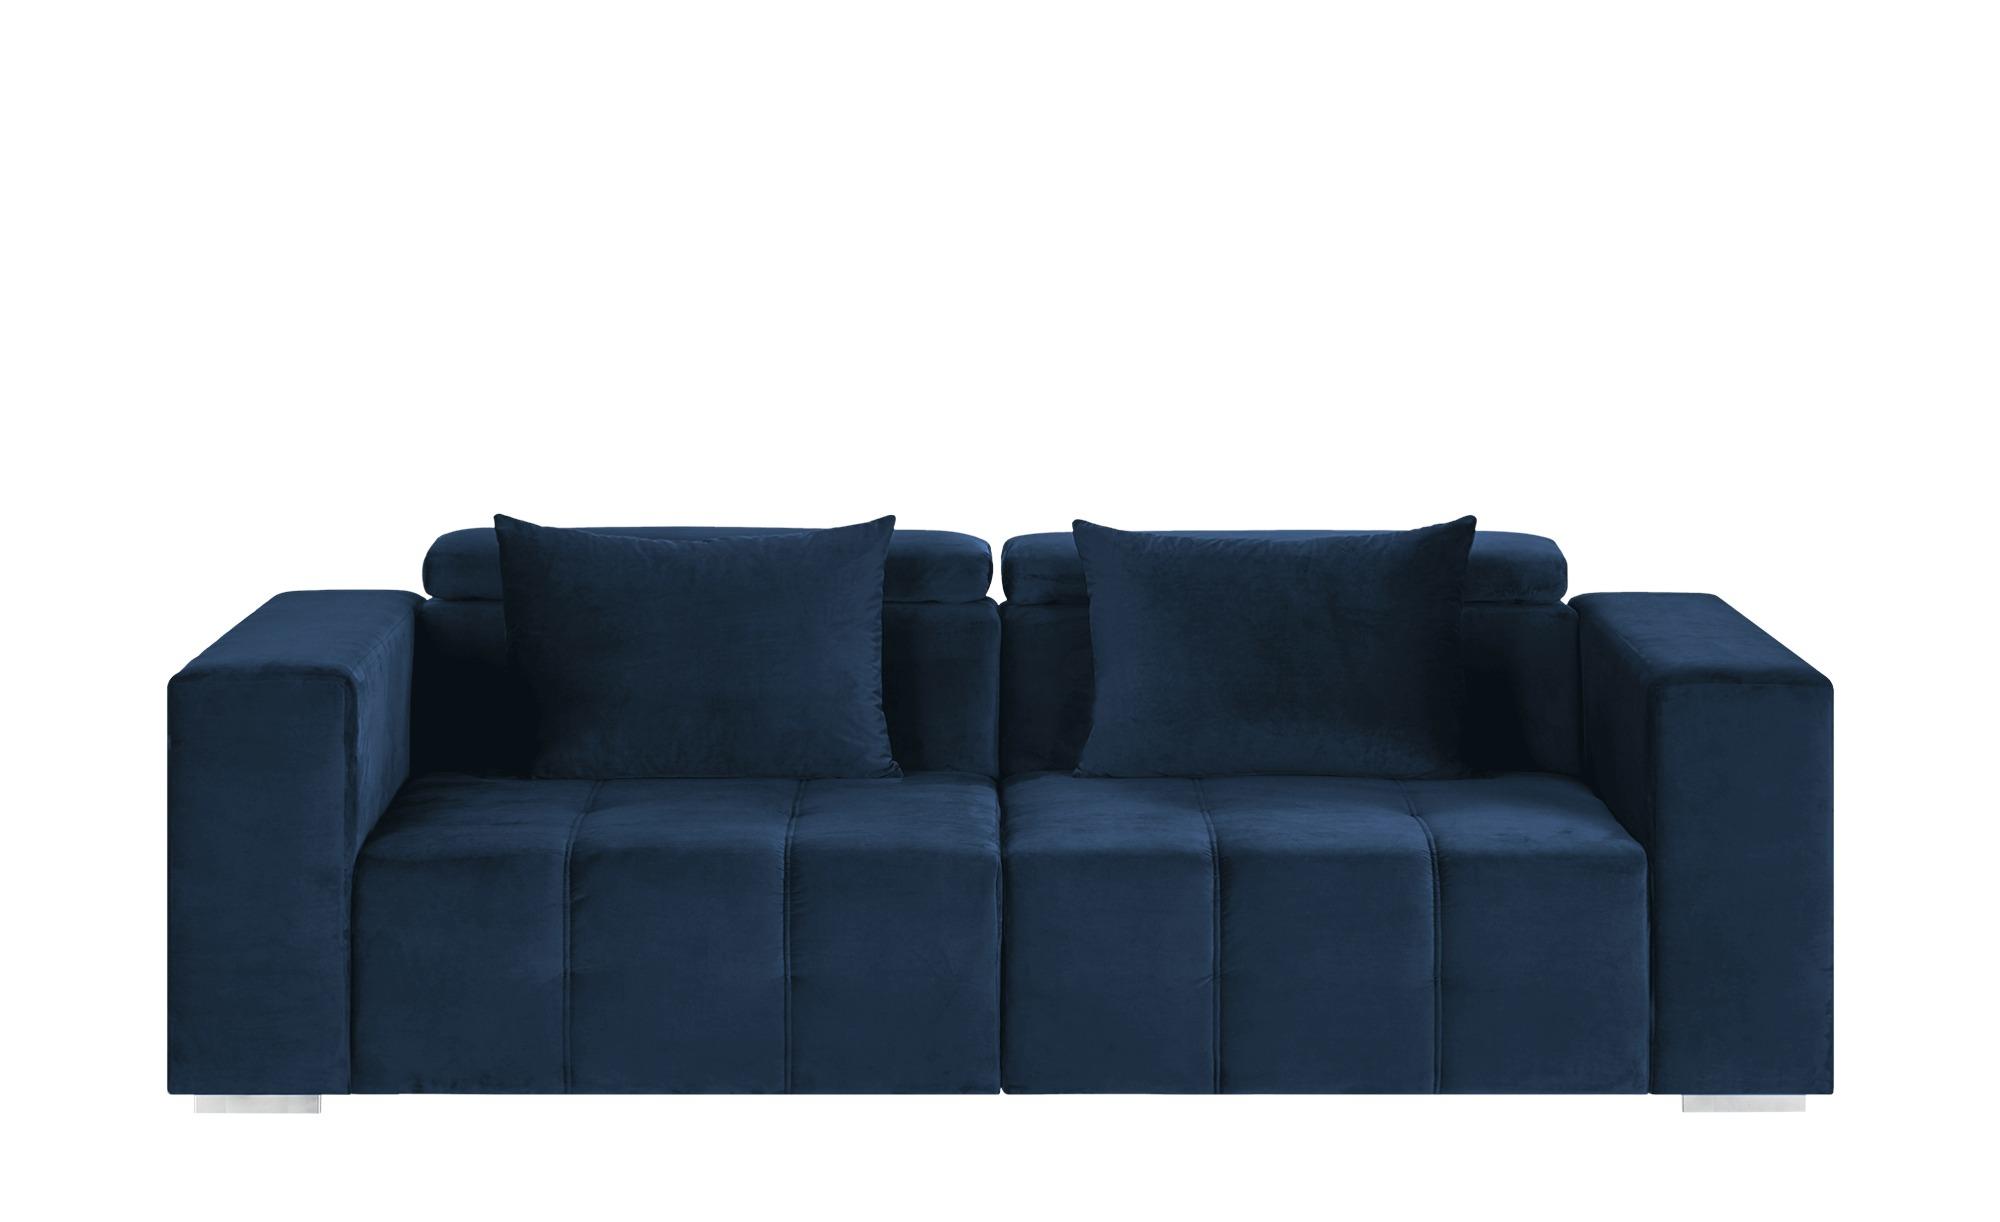 Big Sofa  Vila ¦ blau ¦ Maße (cm): B: 261 H: 79 T: 120 Polstermöbel > Sofas > Big-Sofas - Höffner